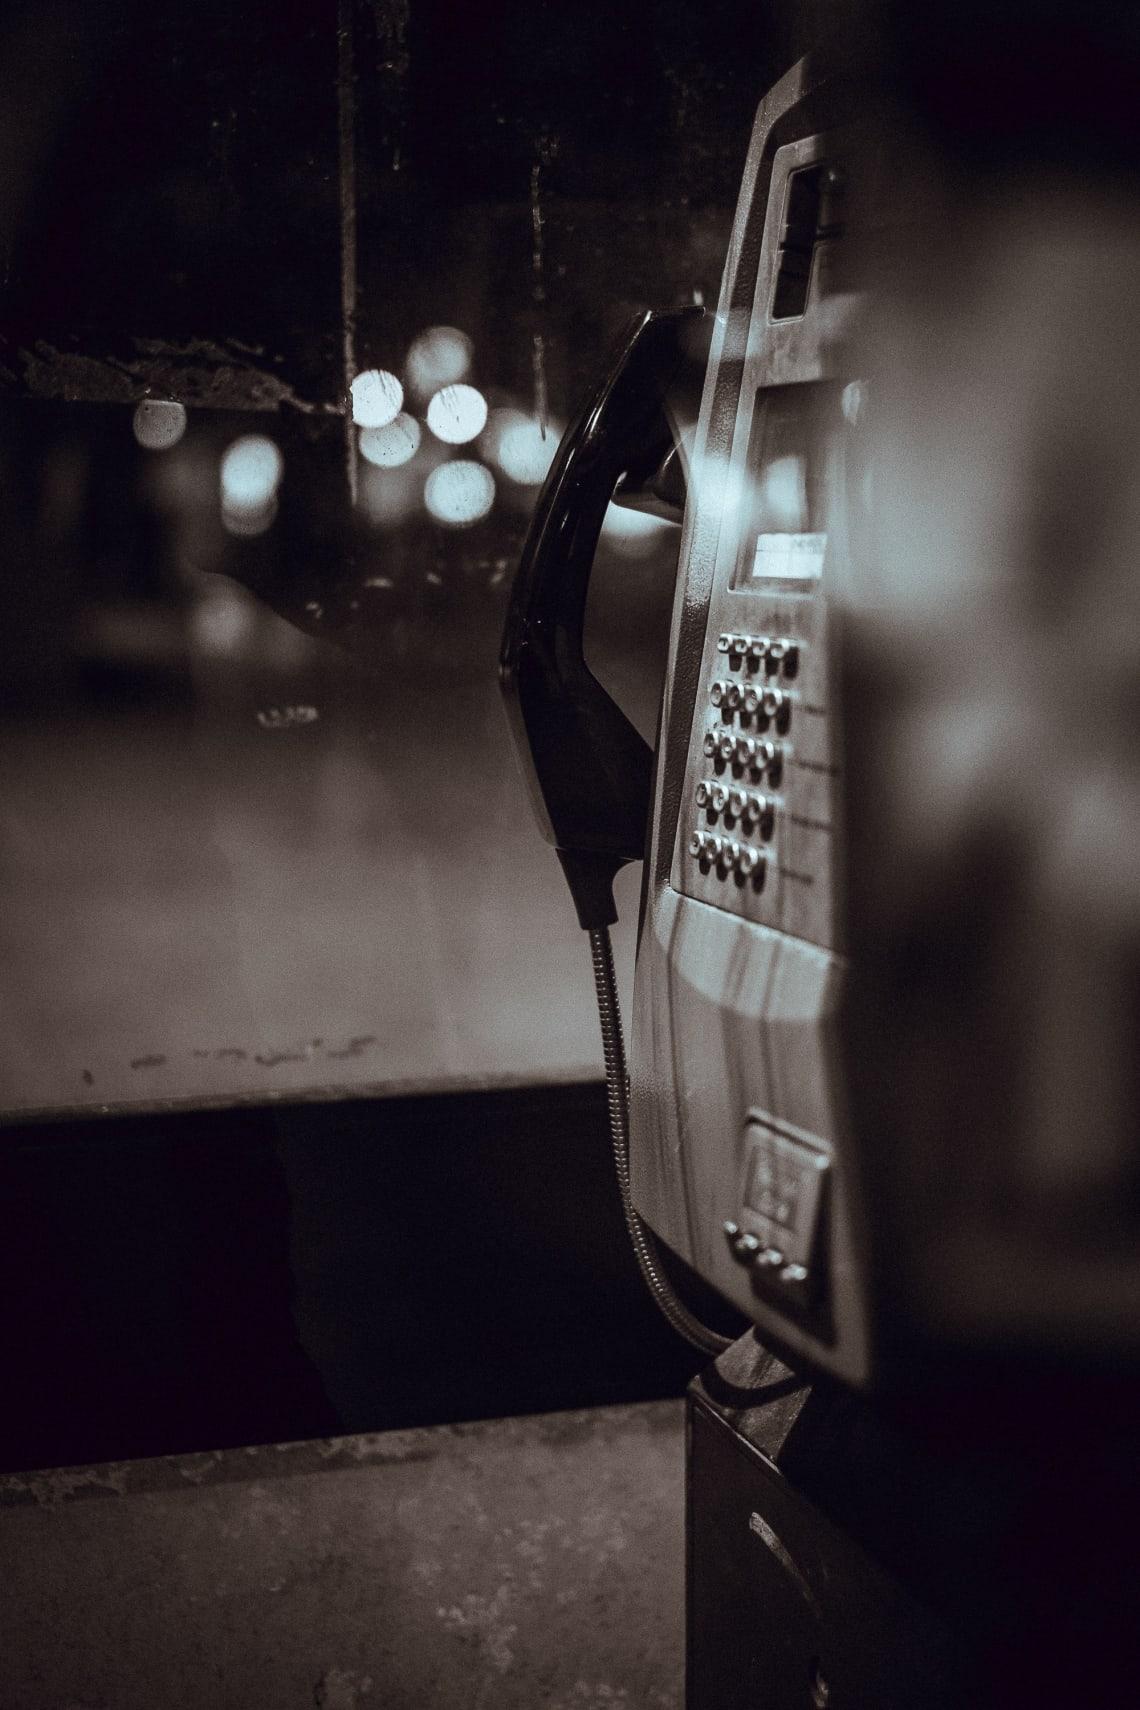 Phone booth, United Kingdom